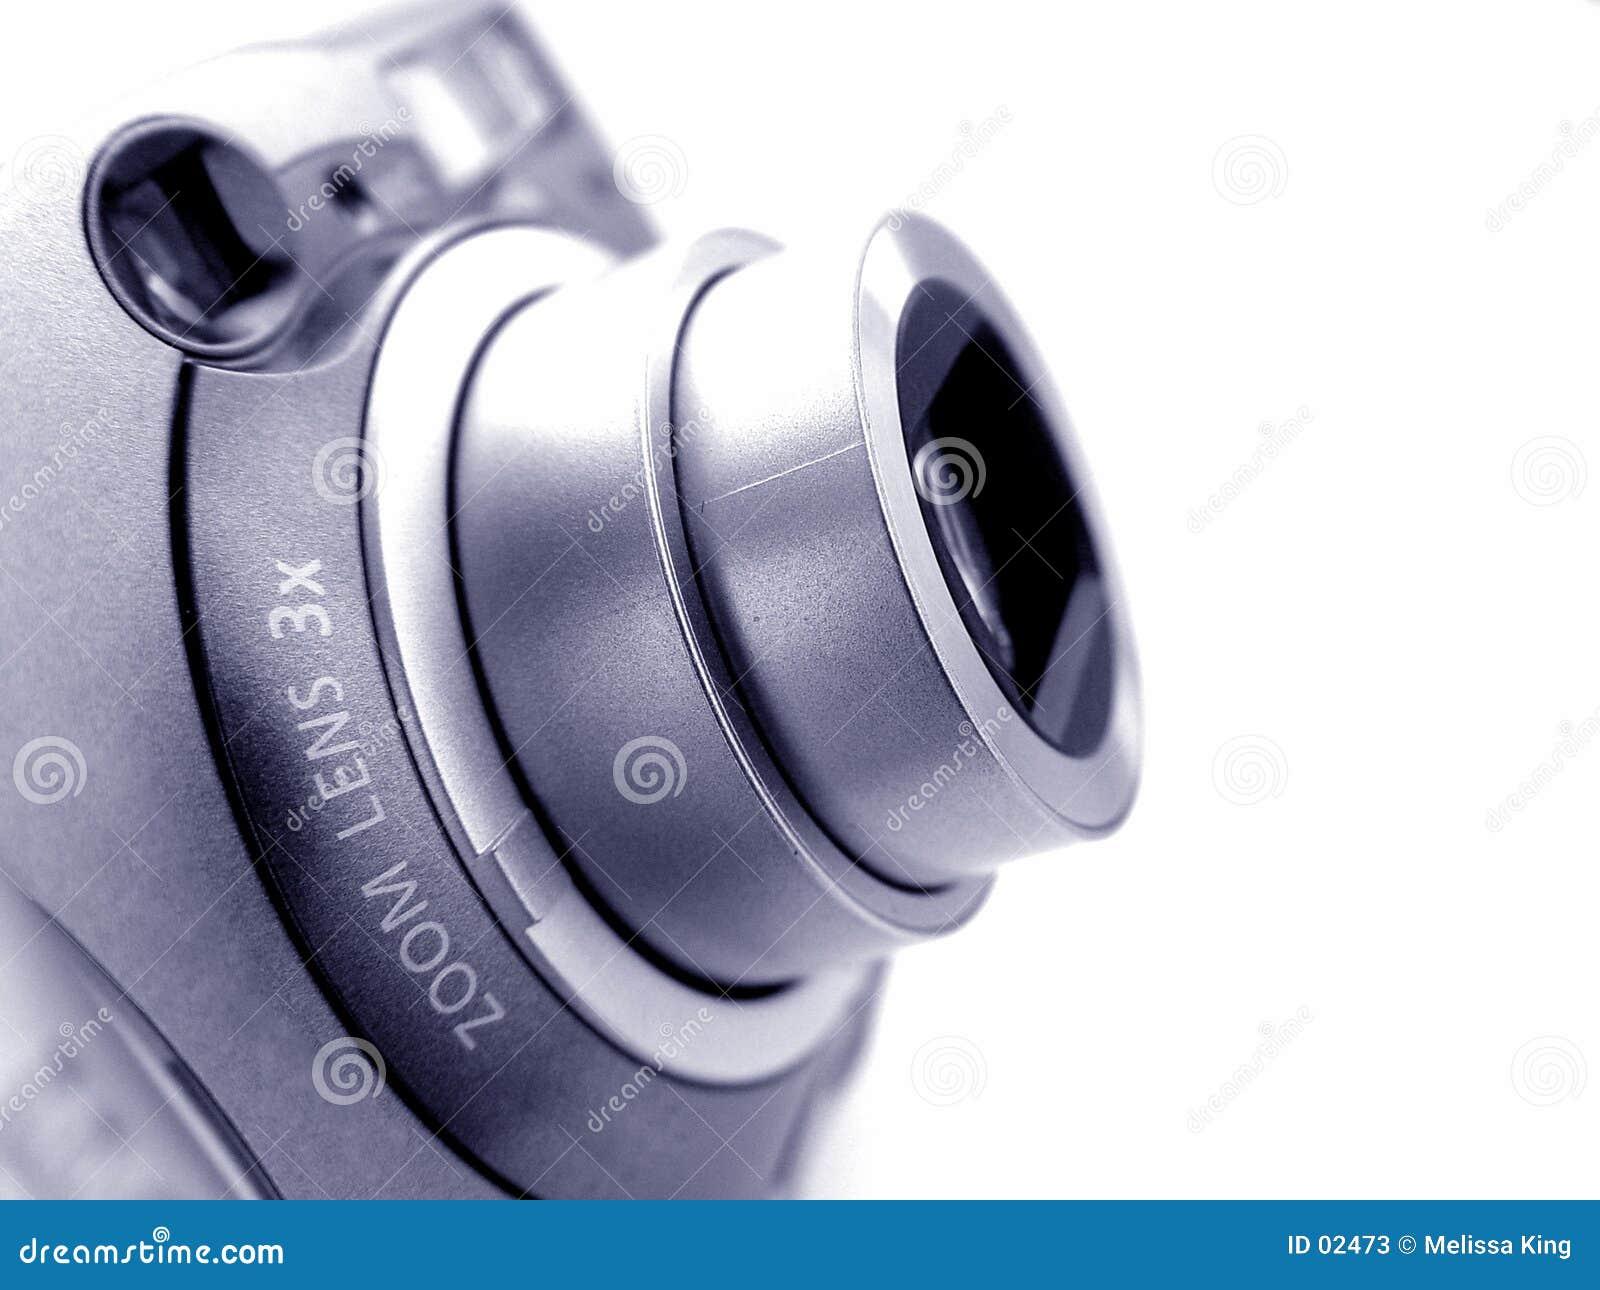 Kamera mit lautem Summen Len